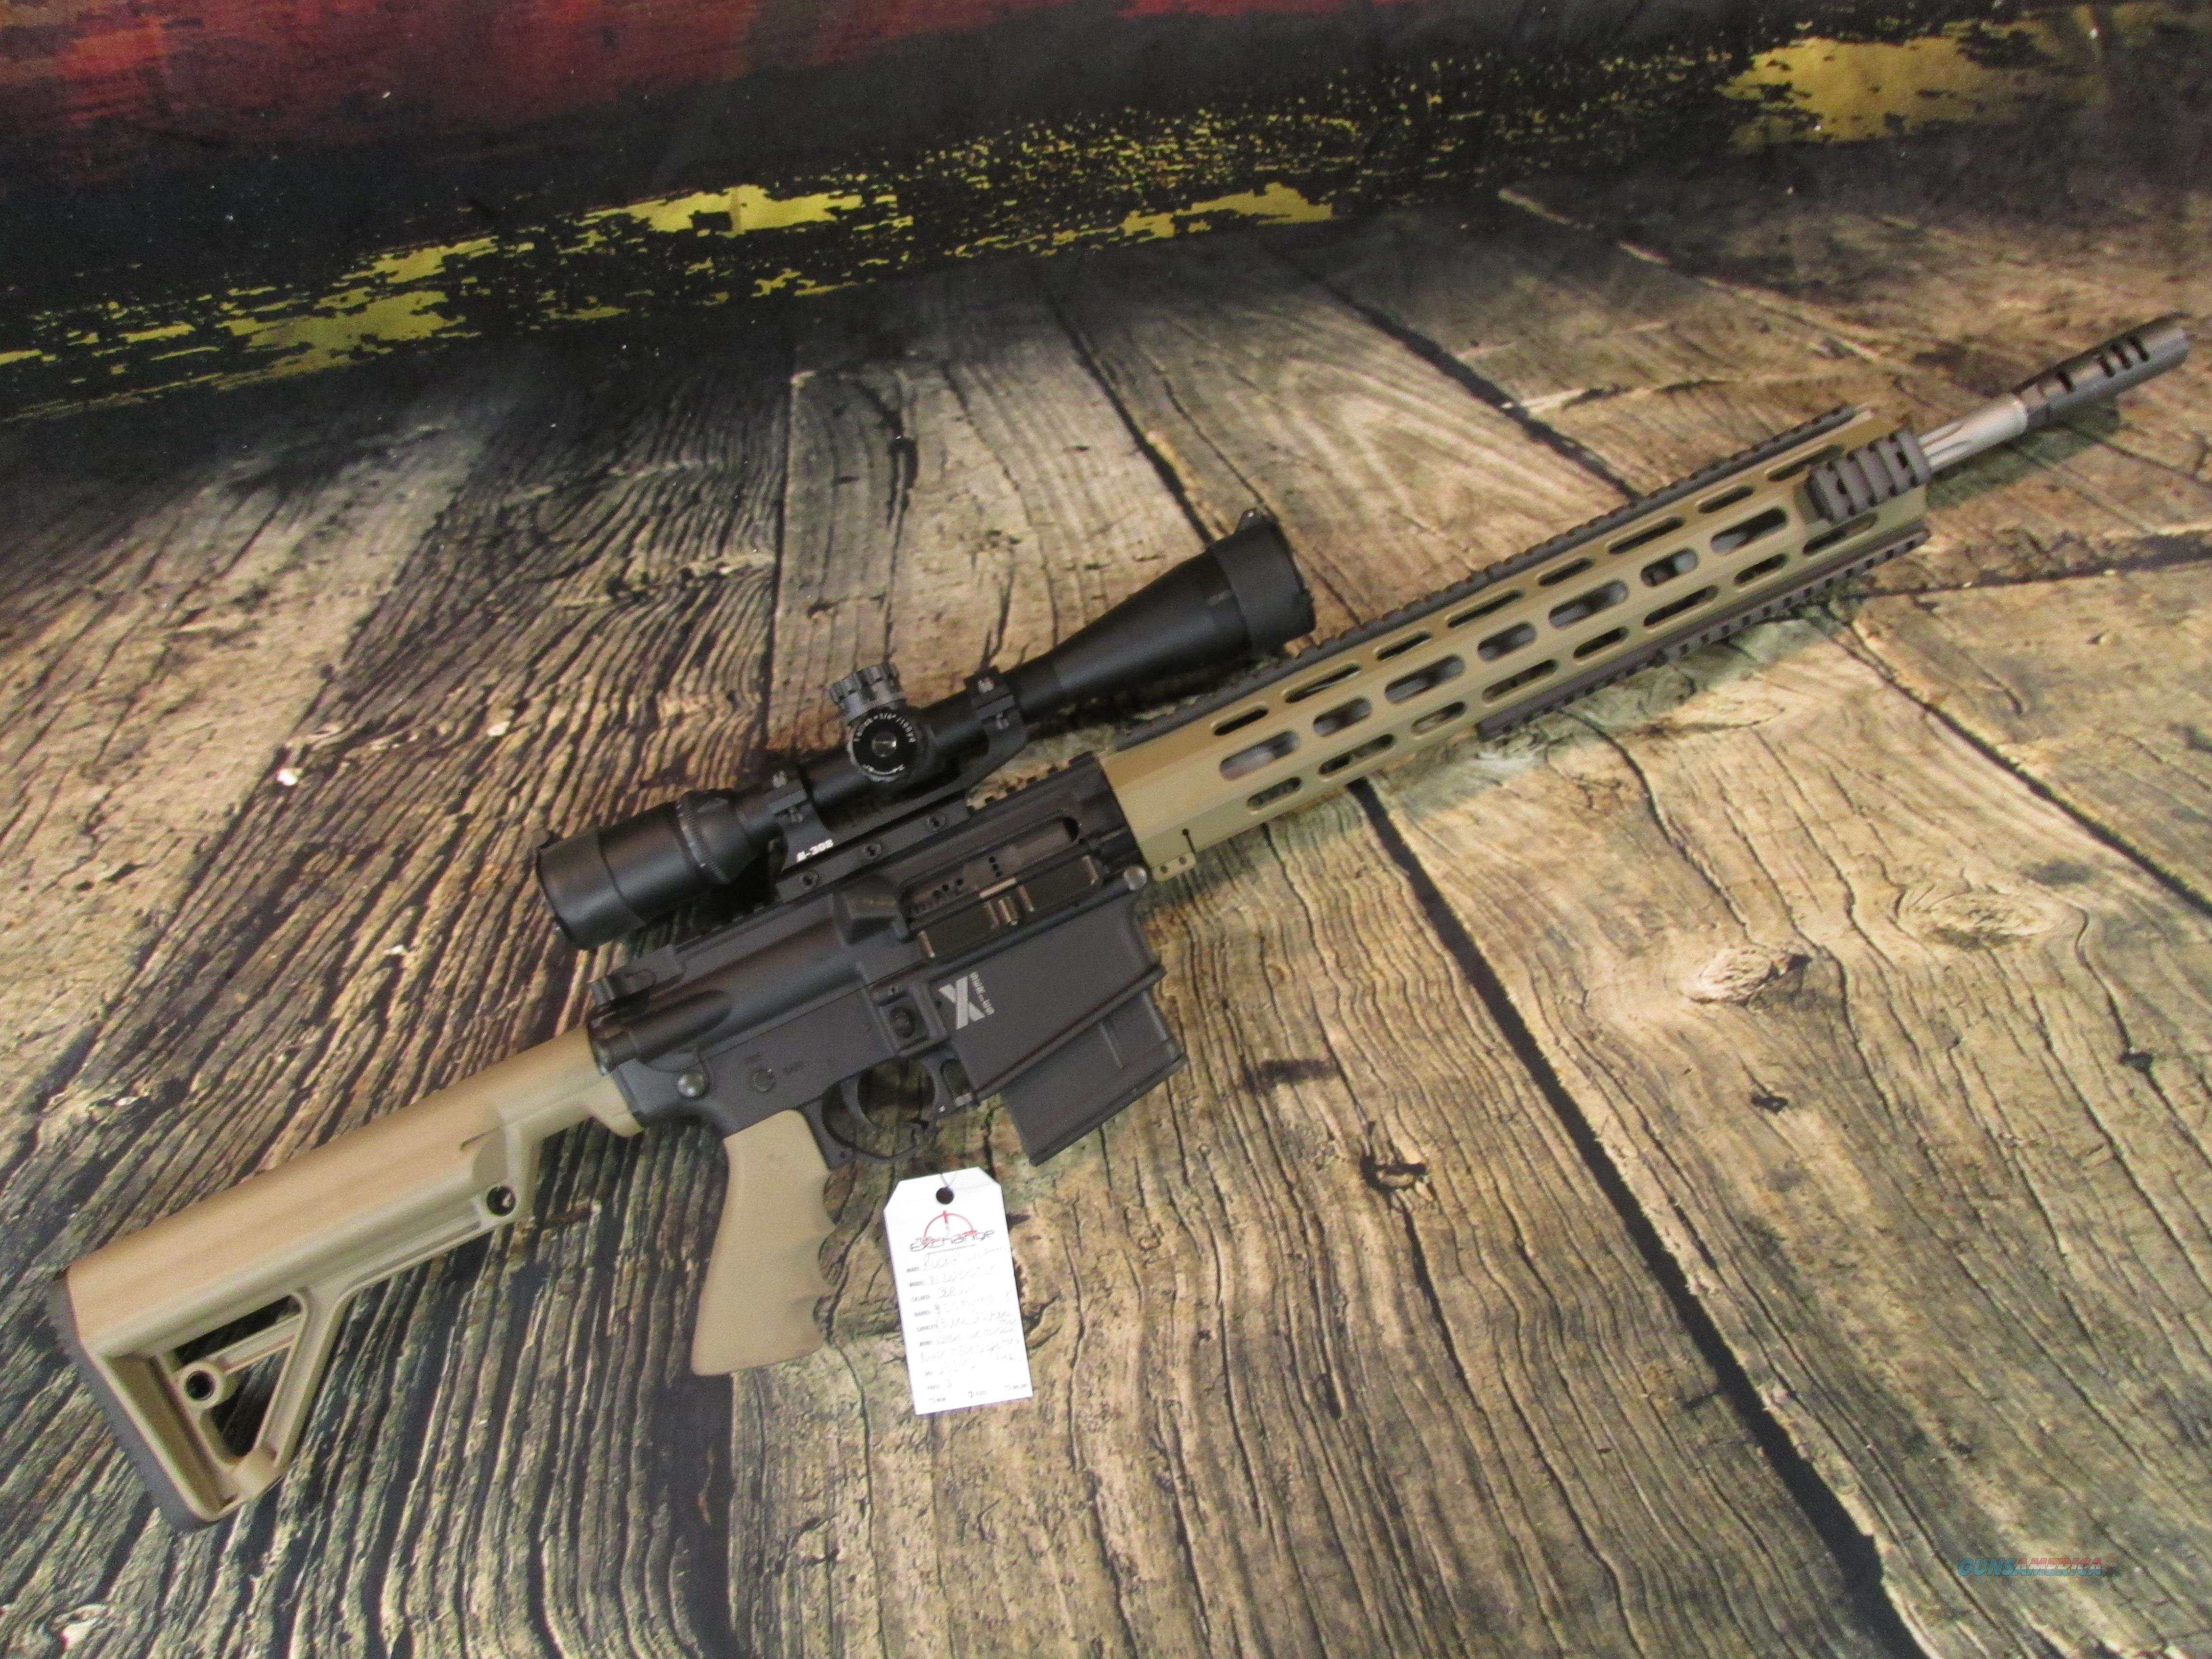 Rock River Arms X-1 LAR-8 Operator 308 Win USED (65290)  Guns > Rifles > Rock River Arms Rifles